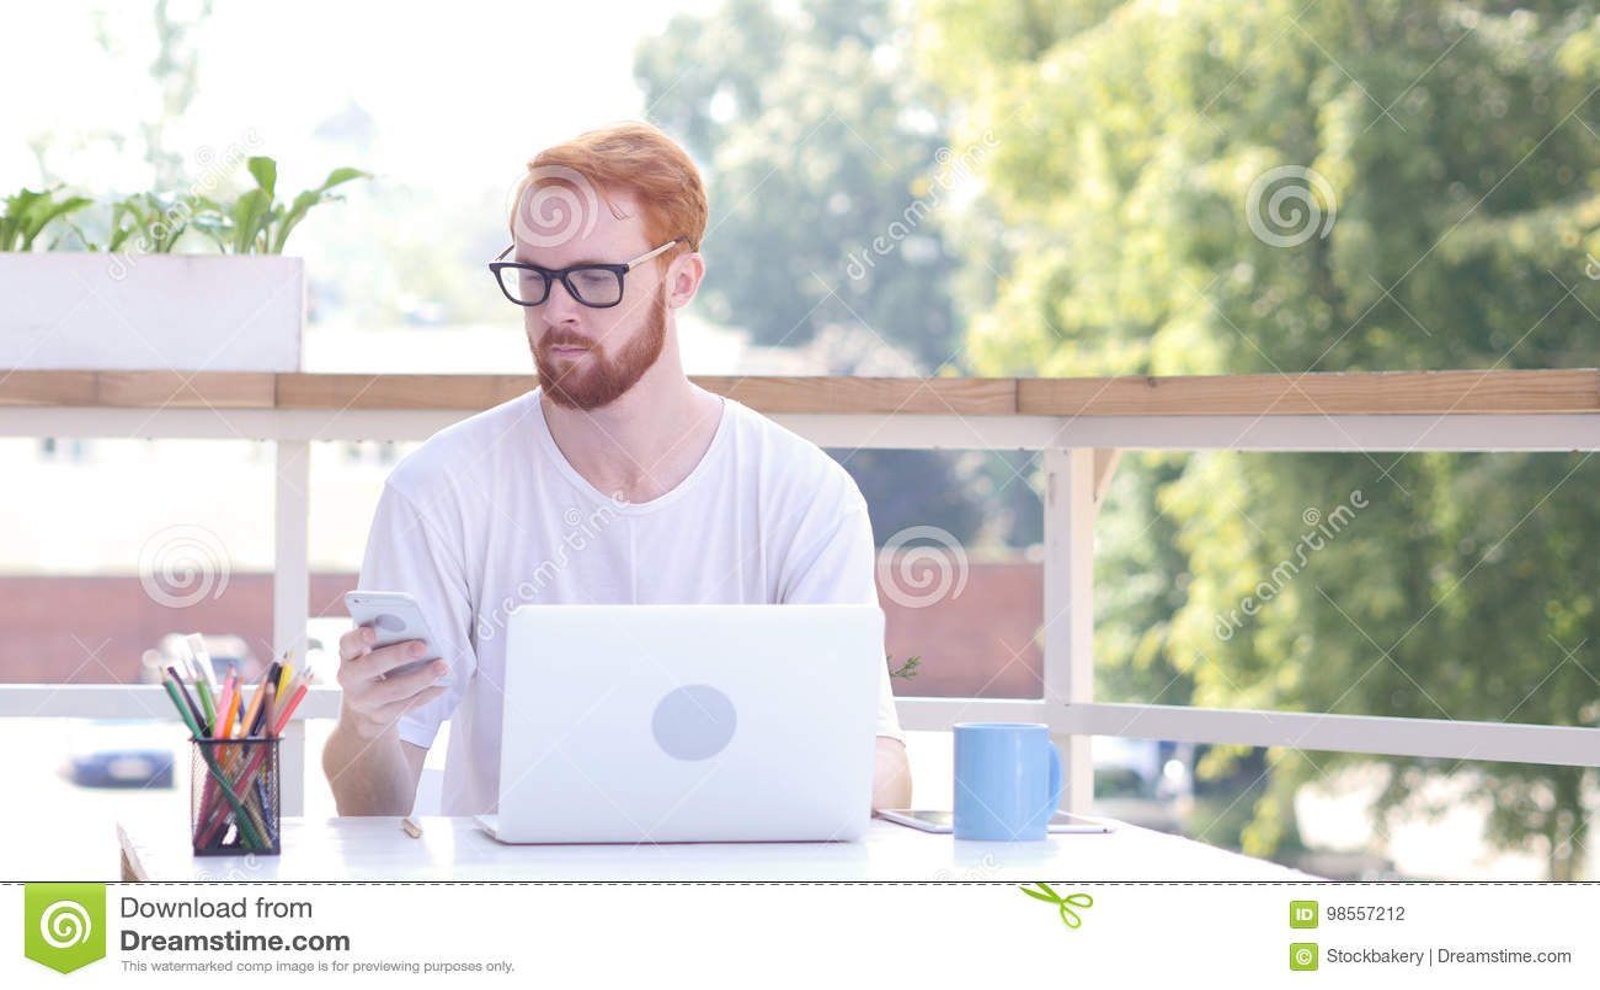 Using Smartphone, Sitting in utdoor Office, Red Hairs